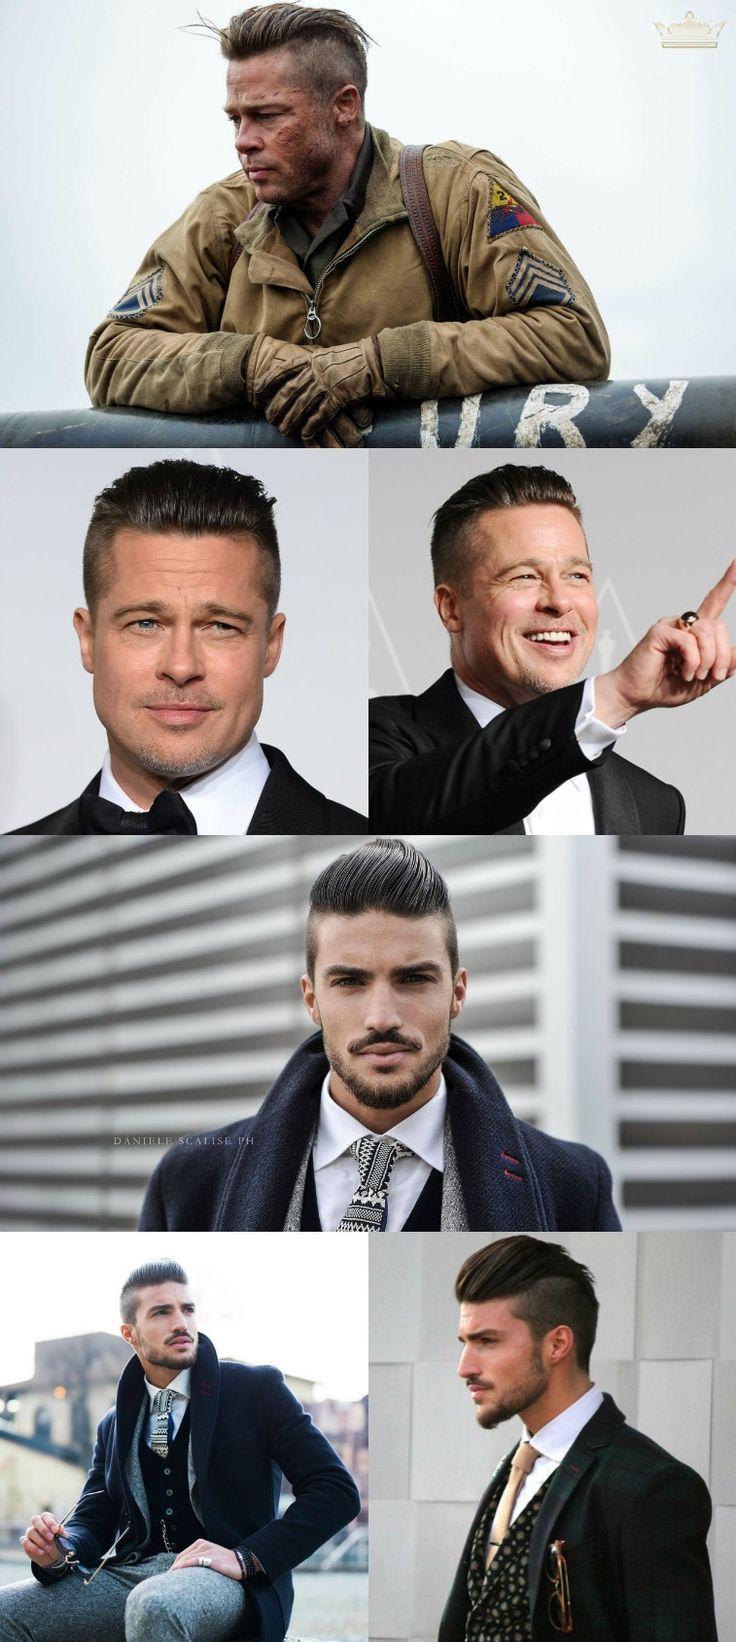 brad pitt and mariano di vaio haircut